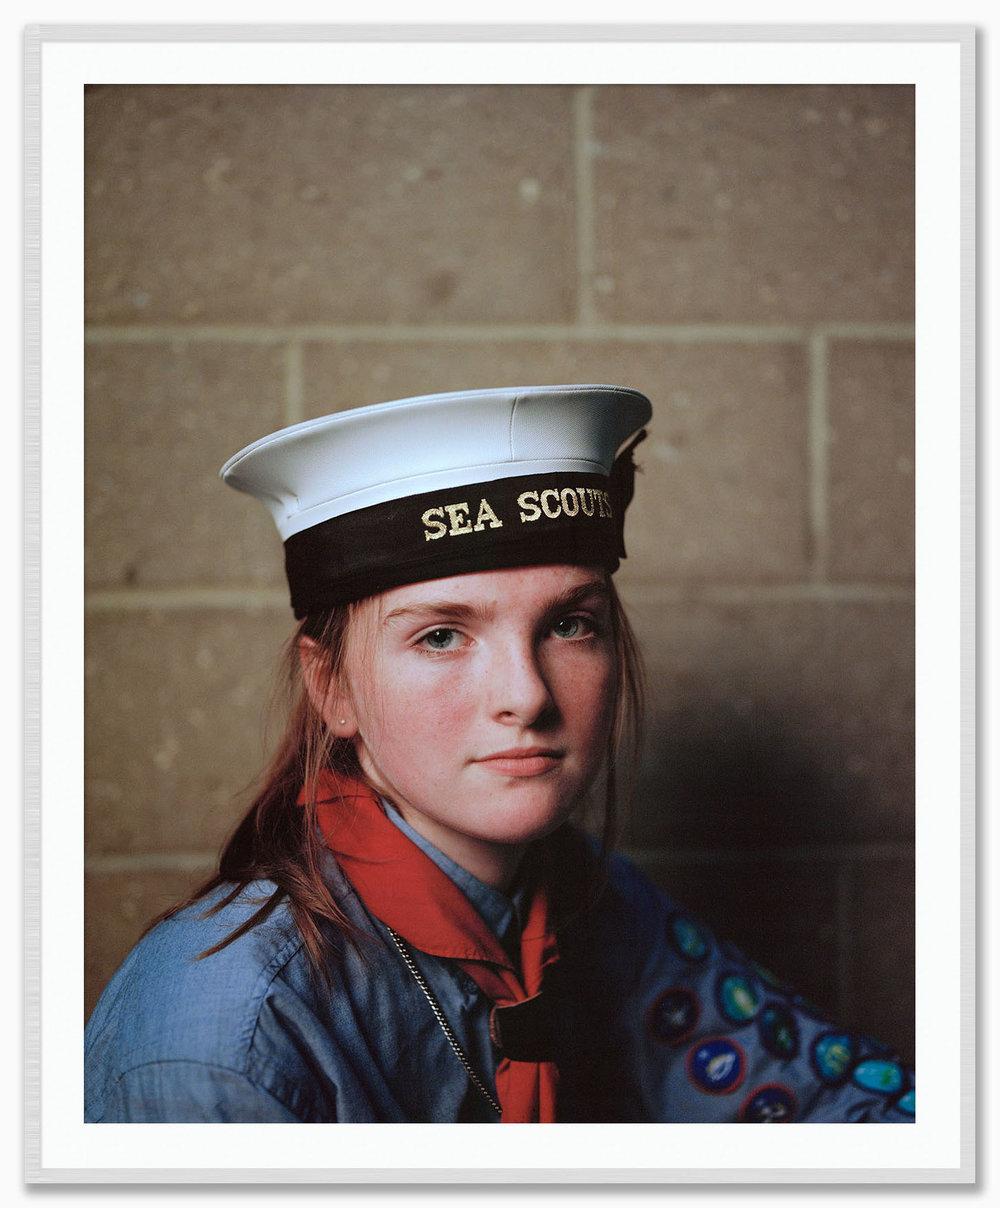 Untitled IV. Sea Scout. England. Izzy de Wattripont_Mat_FrostedSilver.jpg